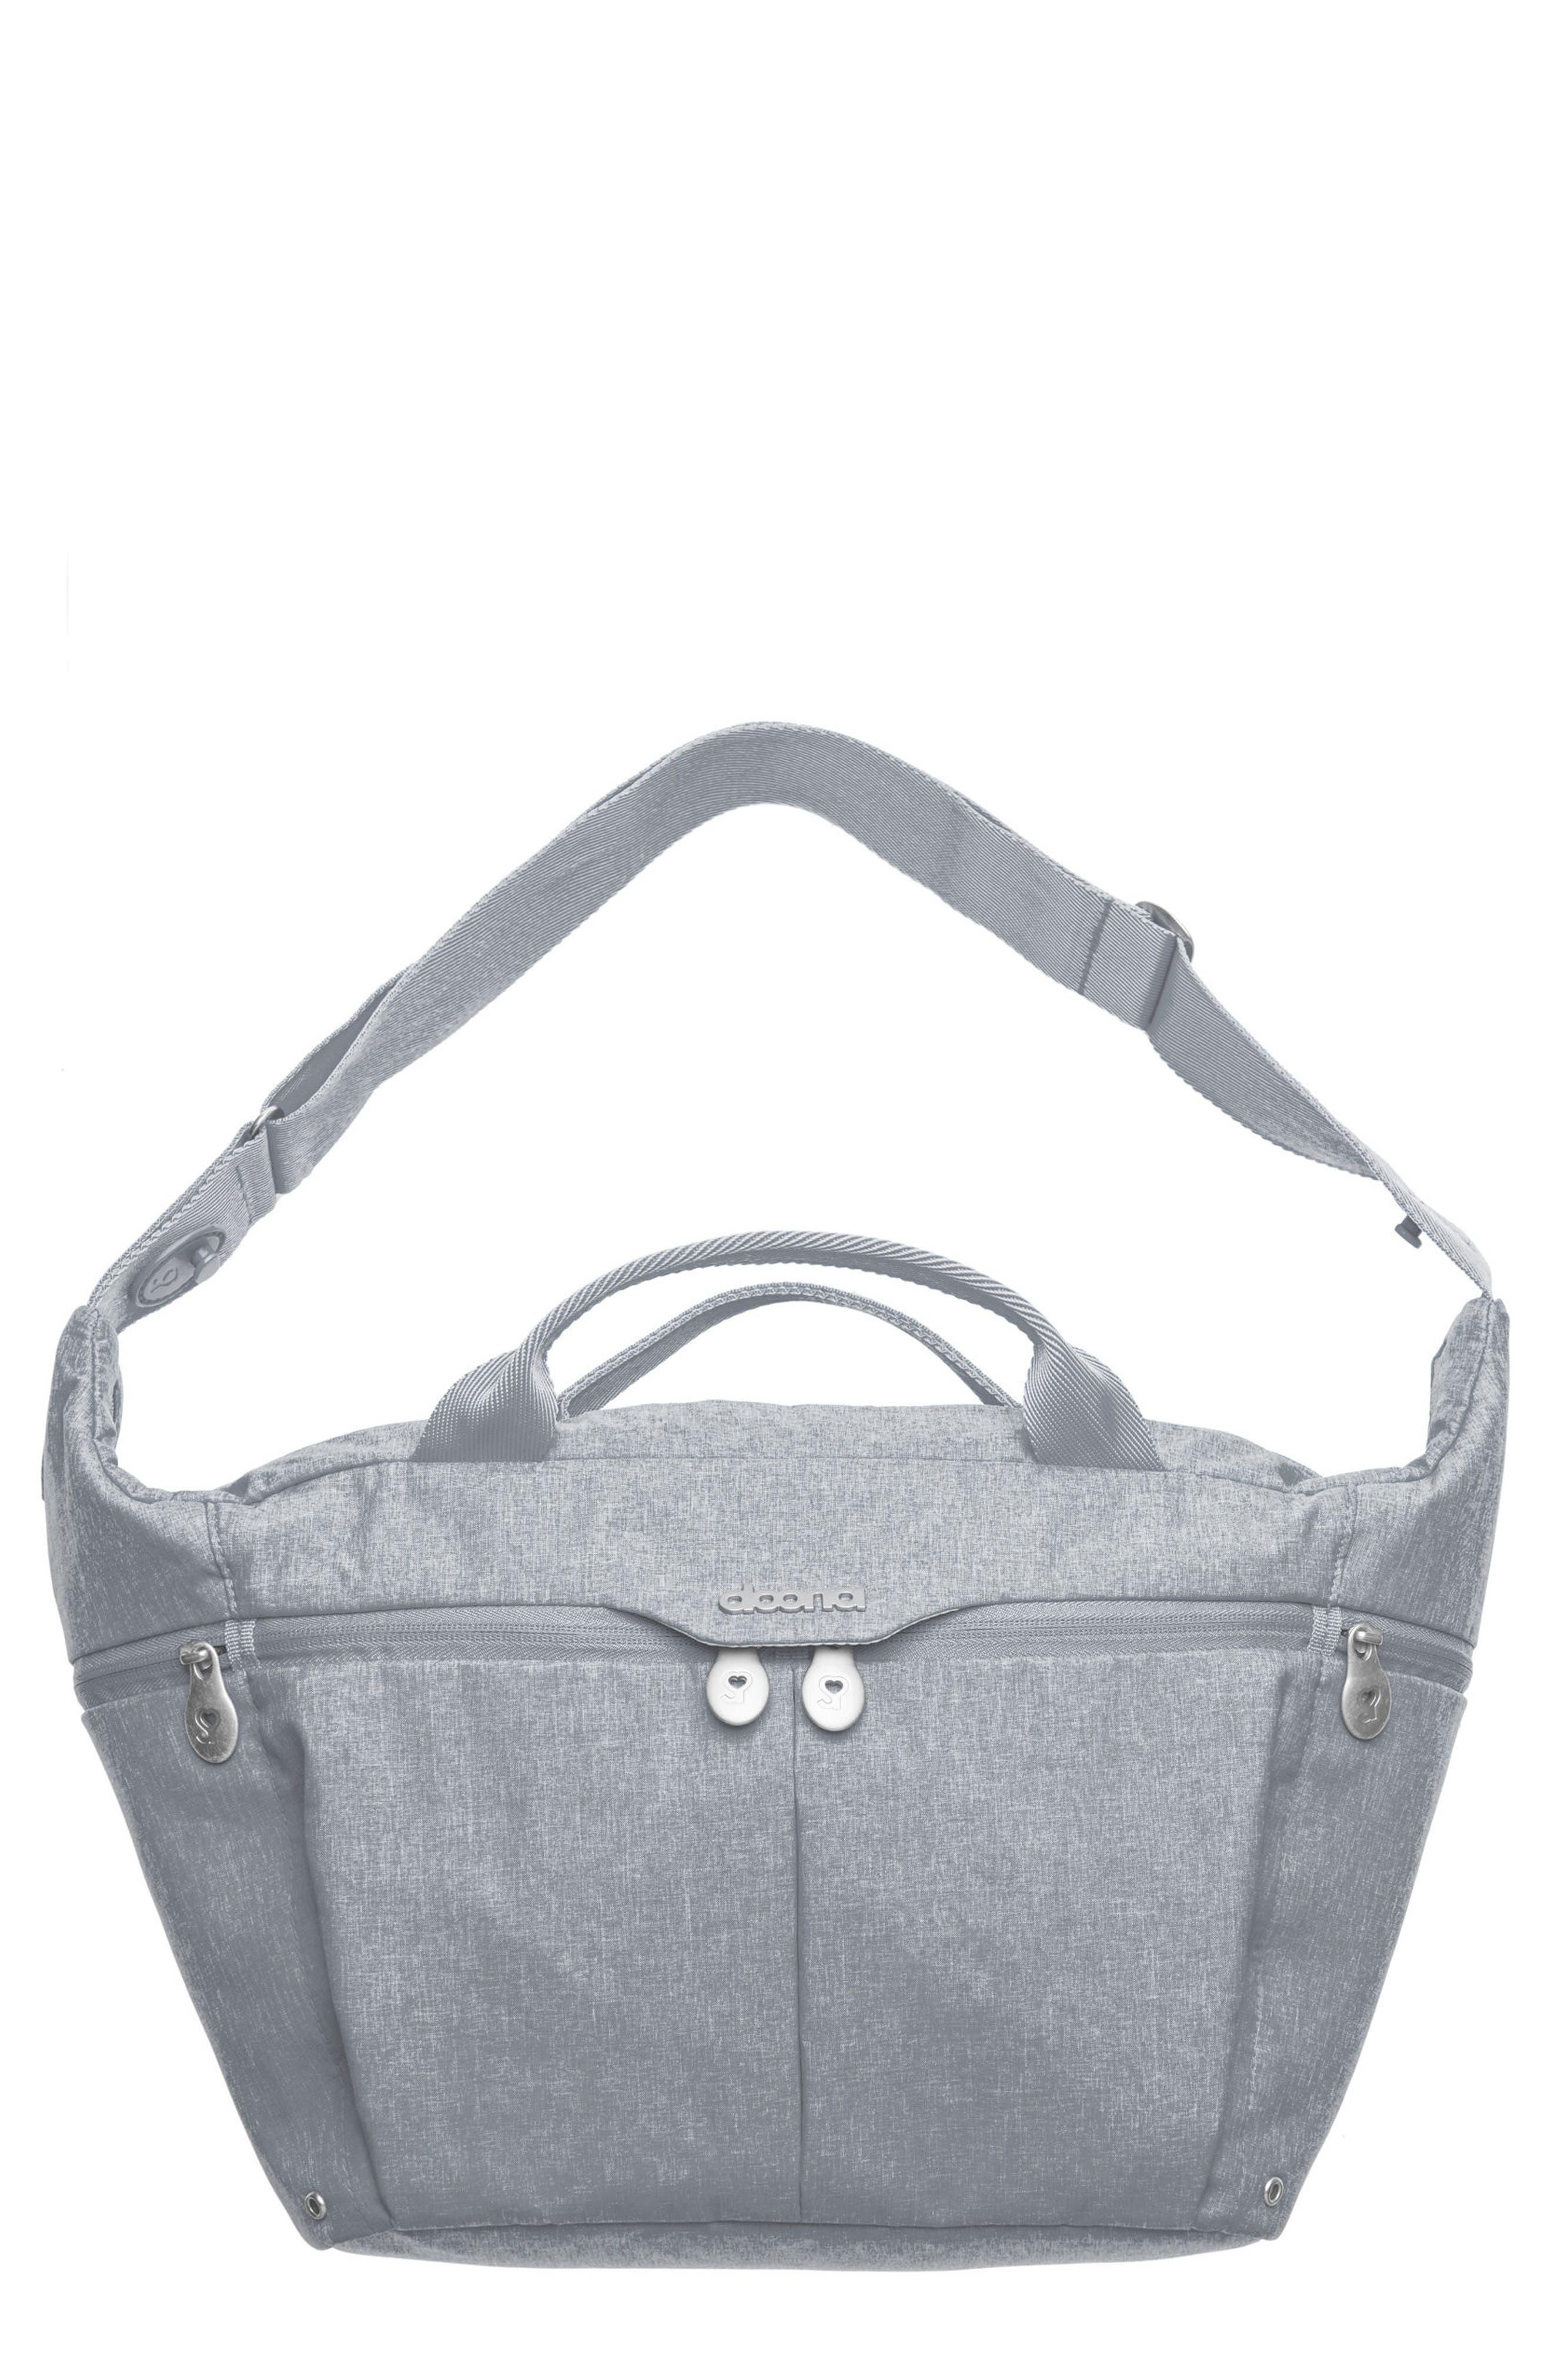 All-Day Diaper Bag,                         Main,                         color, GREY